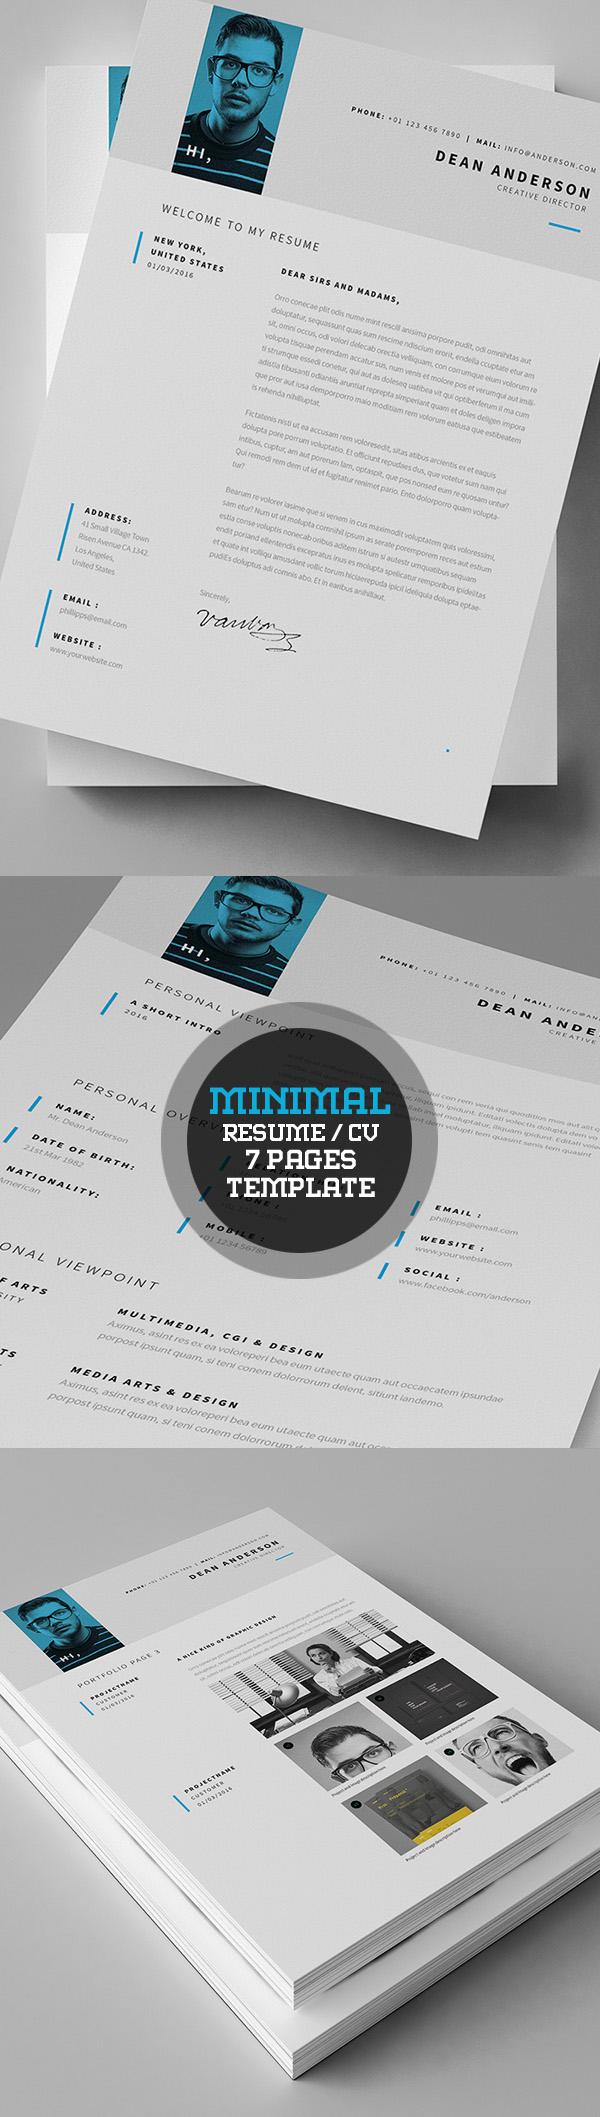 Minimal Resume / Currriculum Vitae (7 Pages) Template